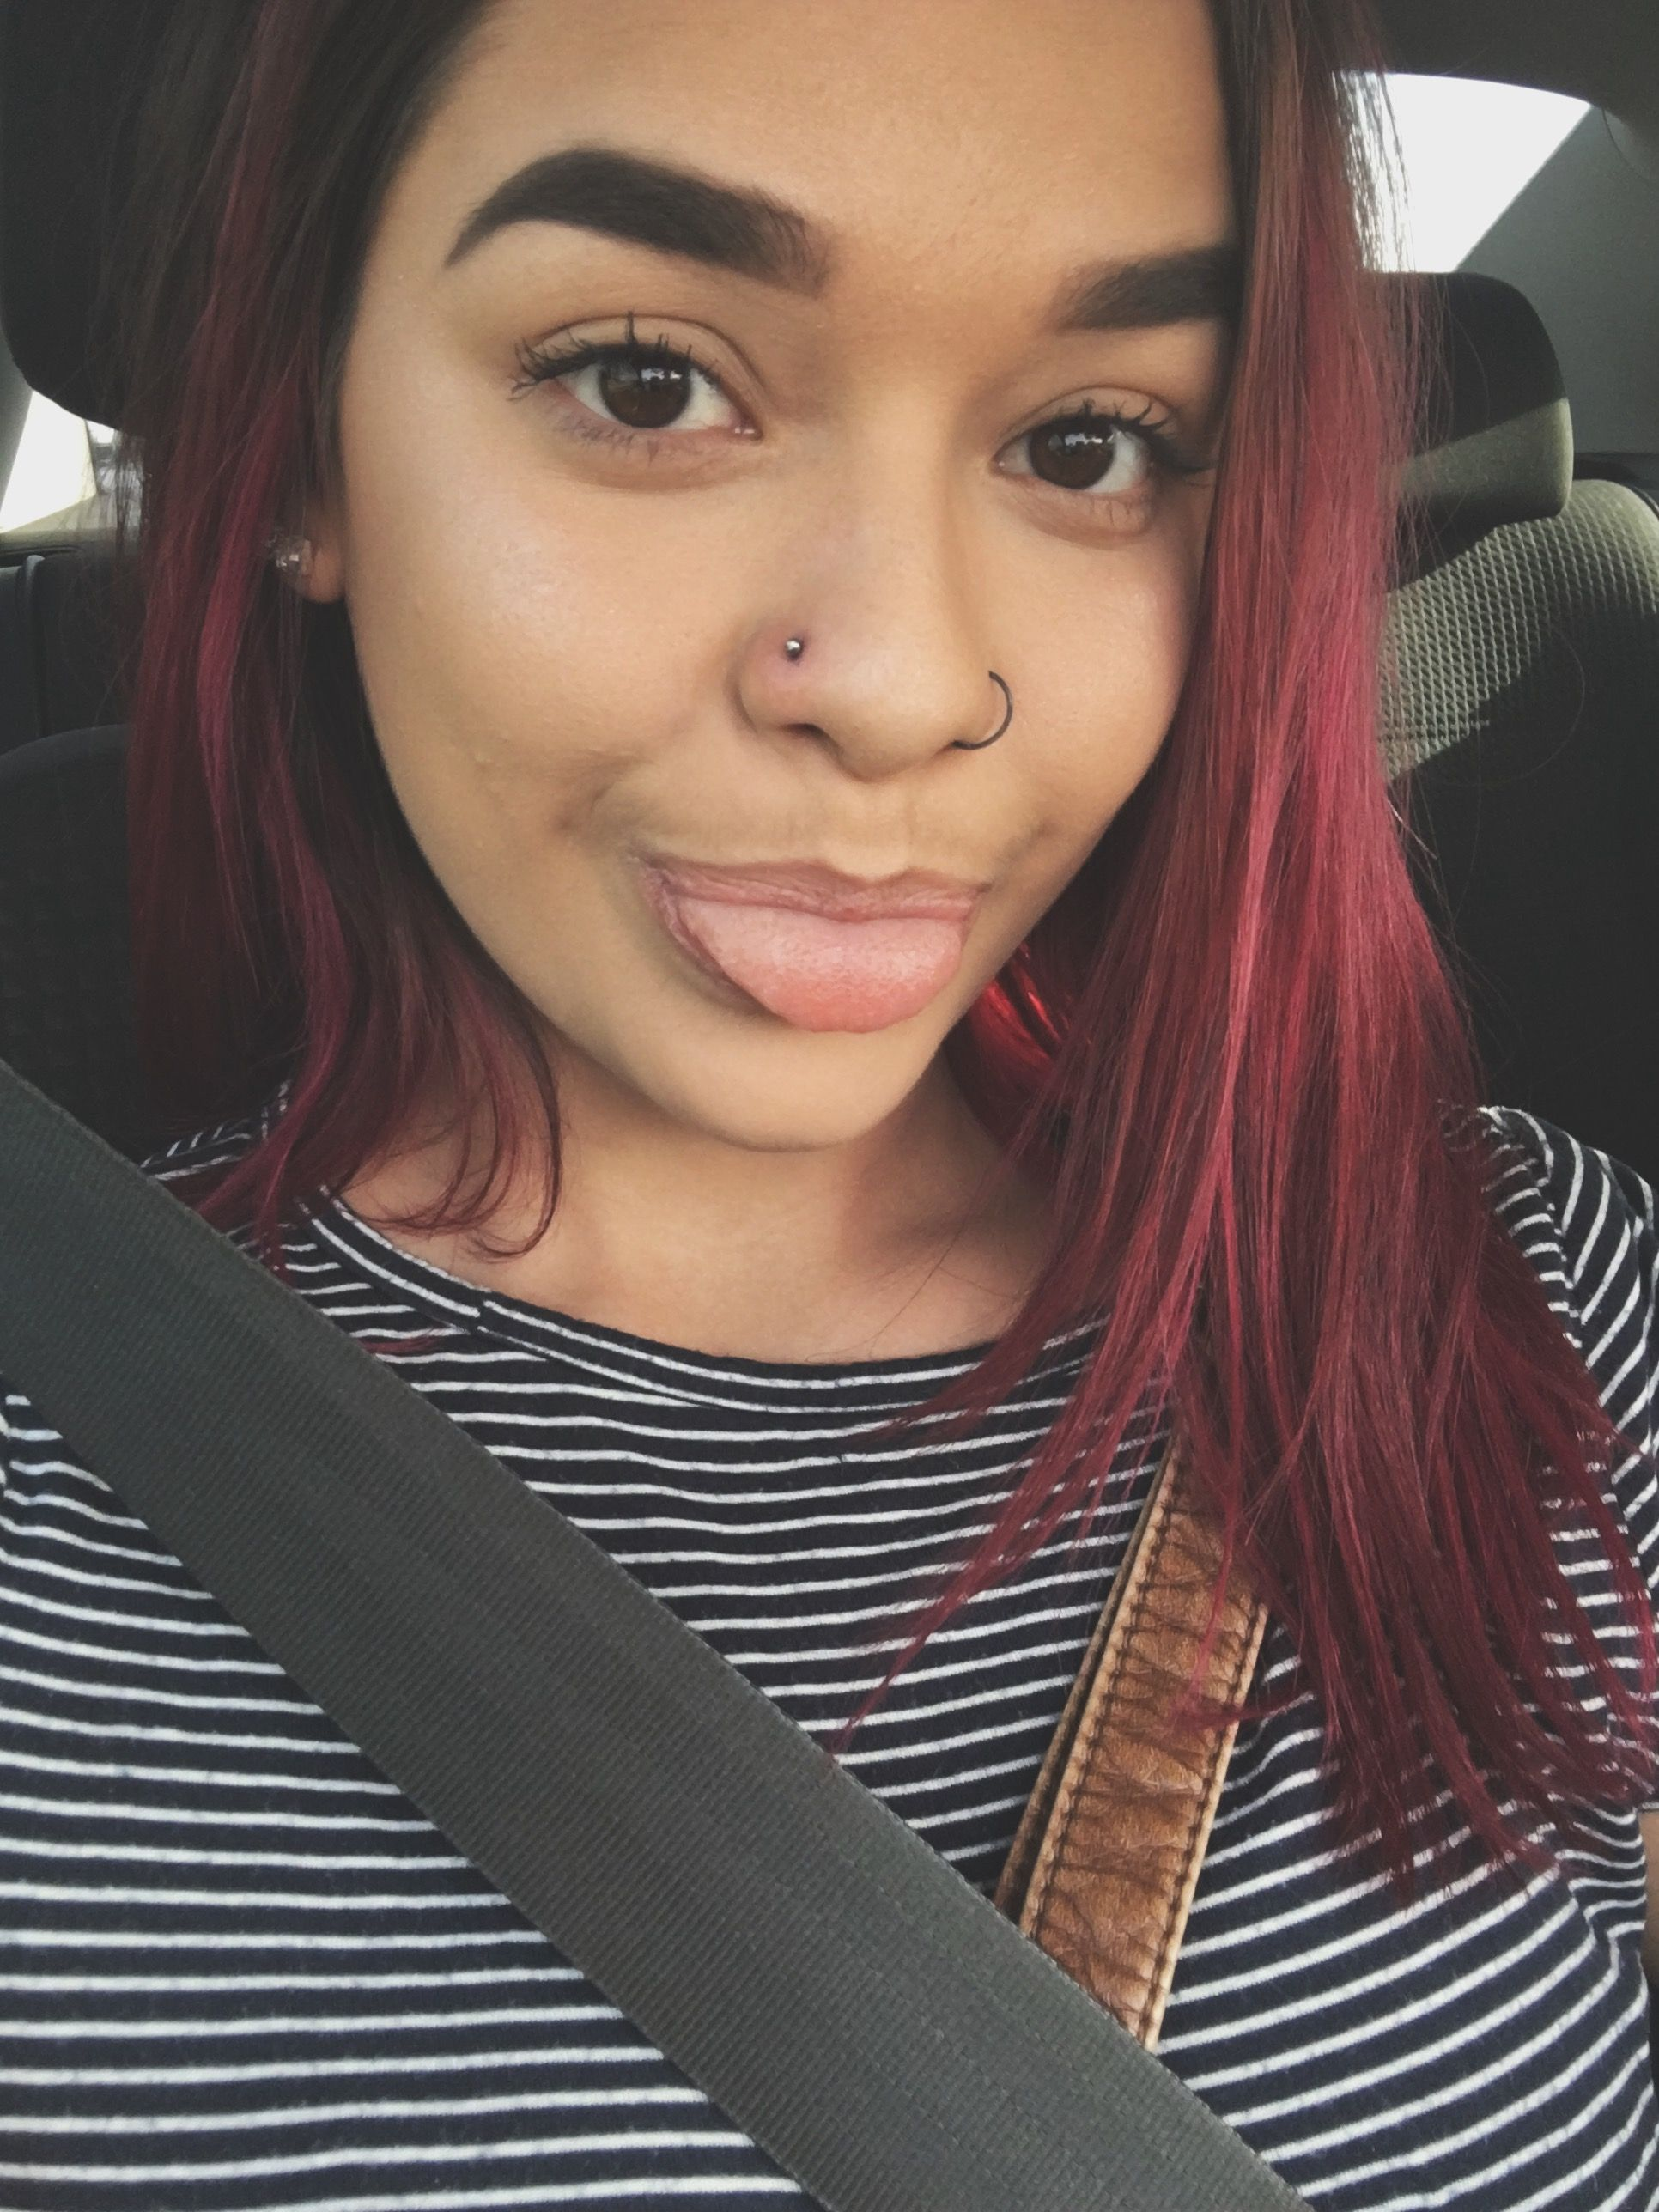 Double nose piercing  Double nose piercing  piercings  Pinterest  Double nose piercing